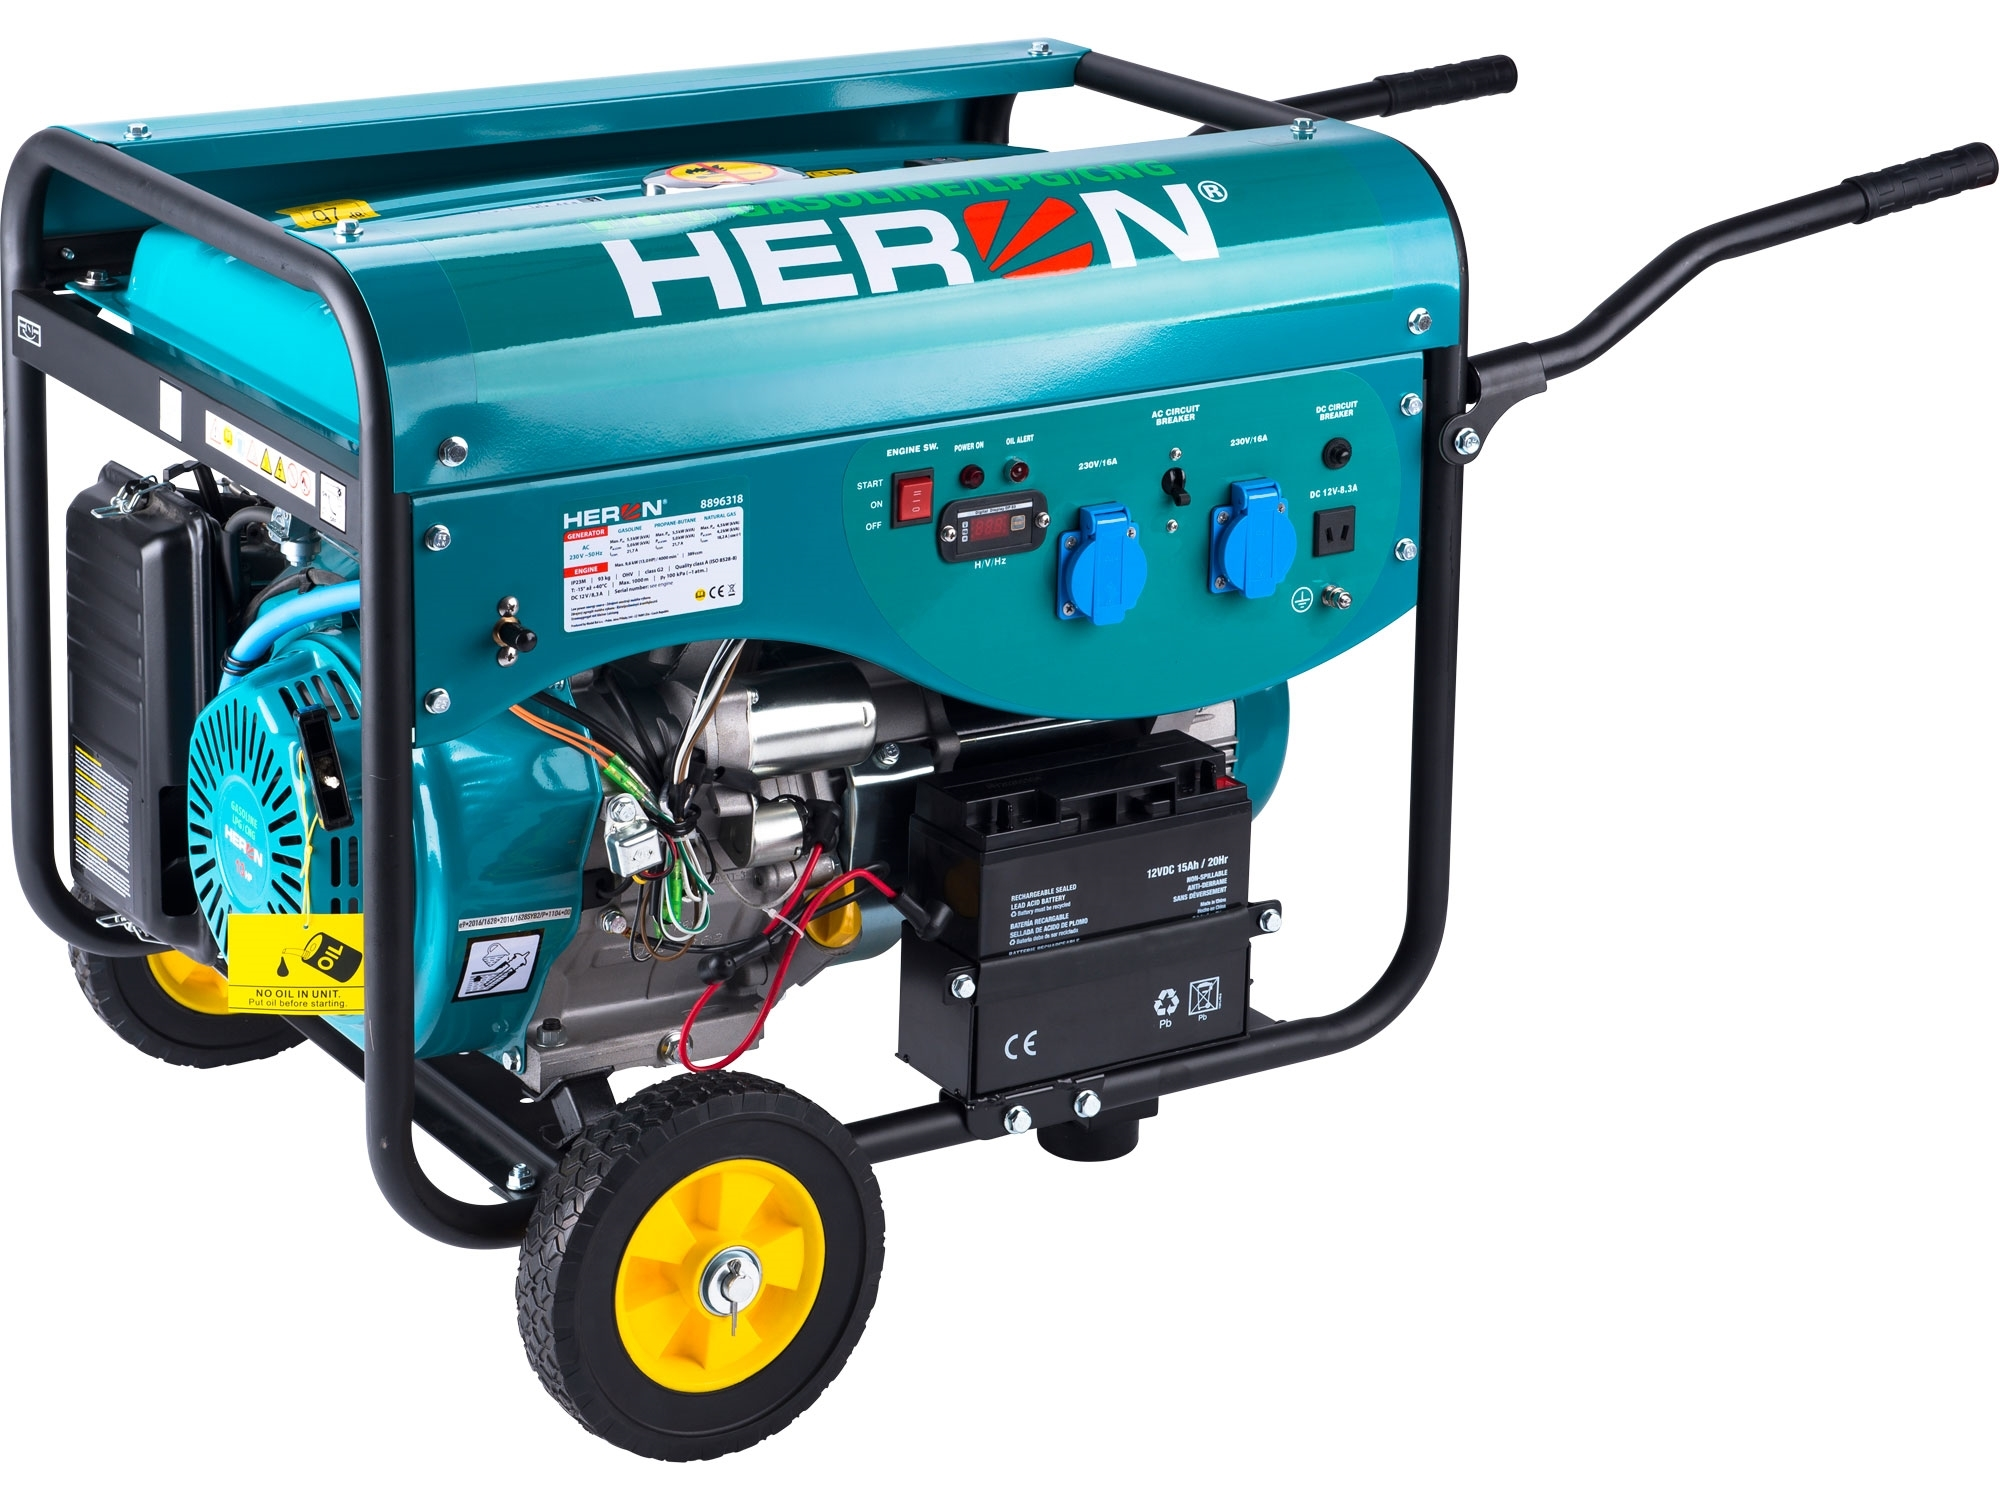 elektrocentrála benzínová a plynová (LGP/NG) 13HP/5,0kW, elektrický start, HERON, LPGG 50 8896318